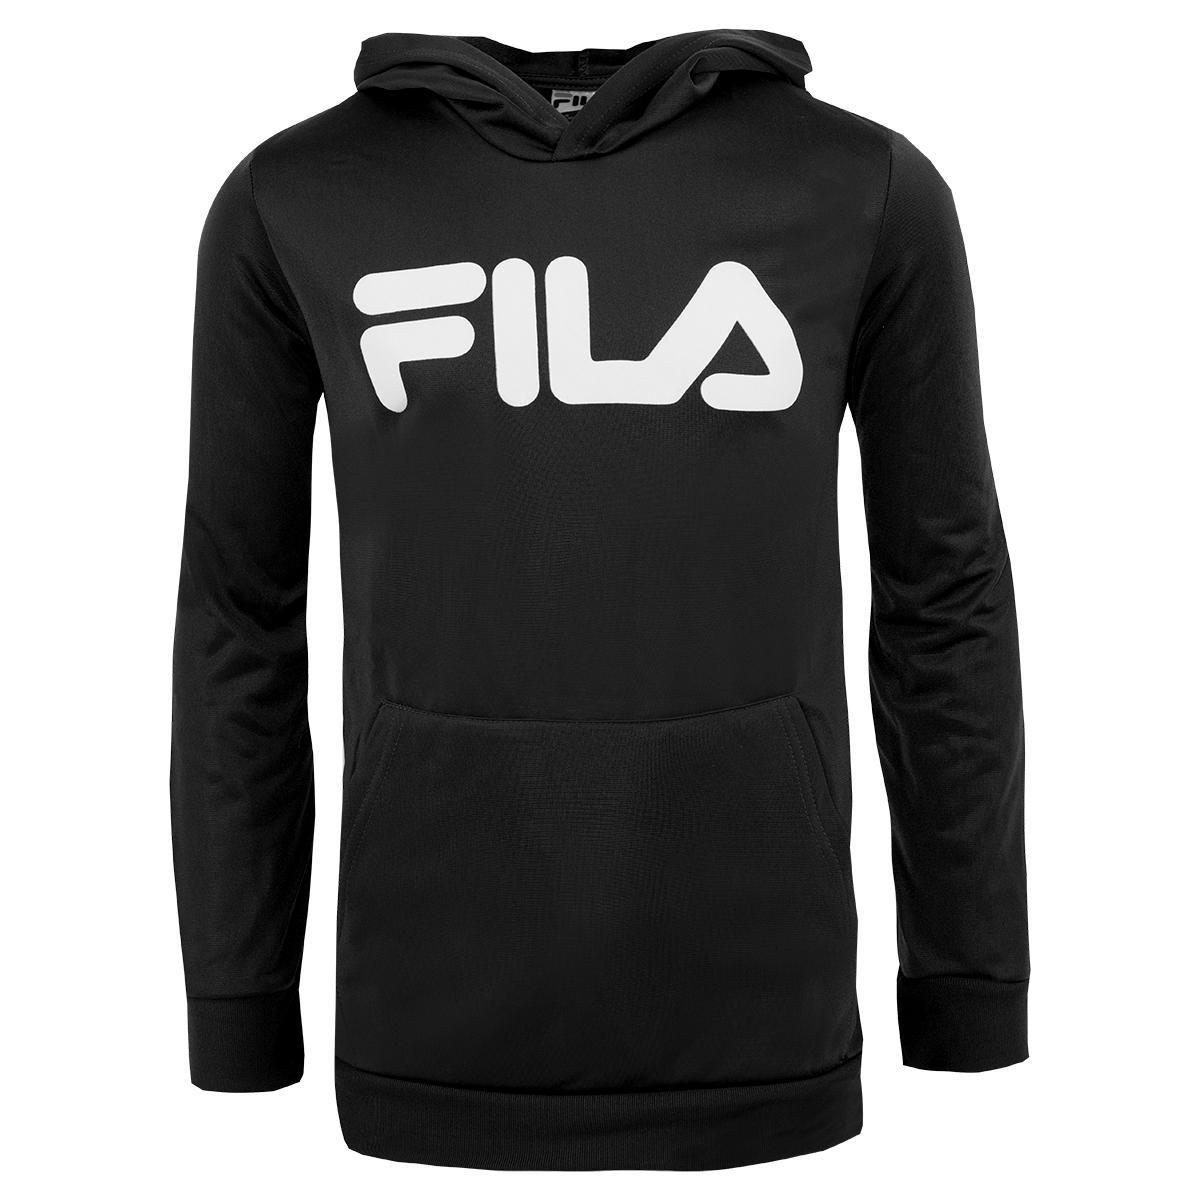 f96bca23 Details about Fila Boy's Classic Logo Hoodie Black/White M